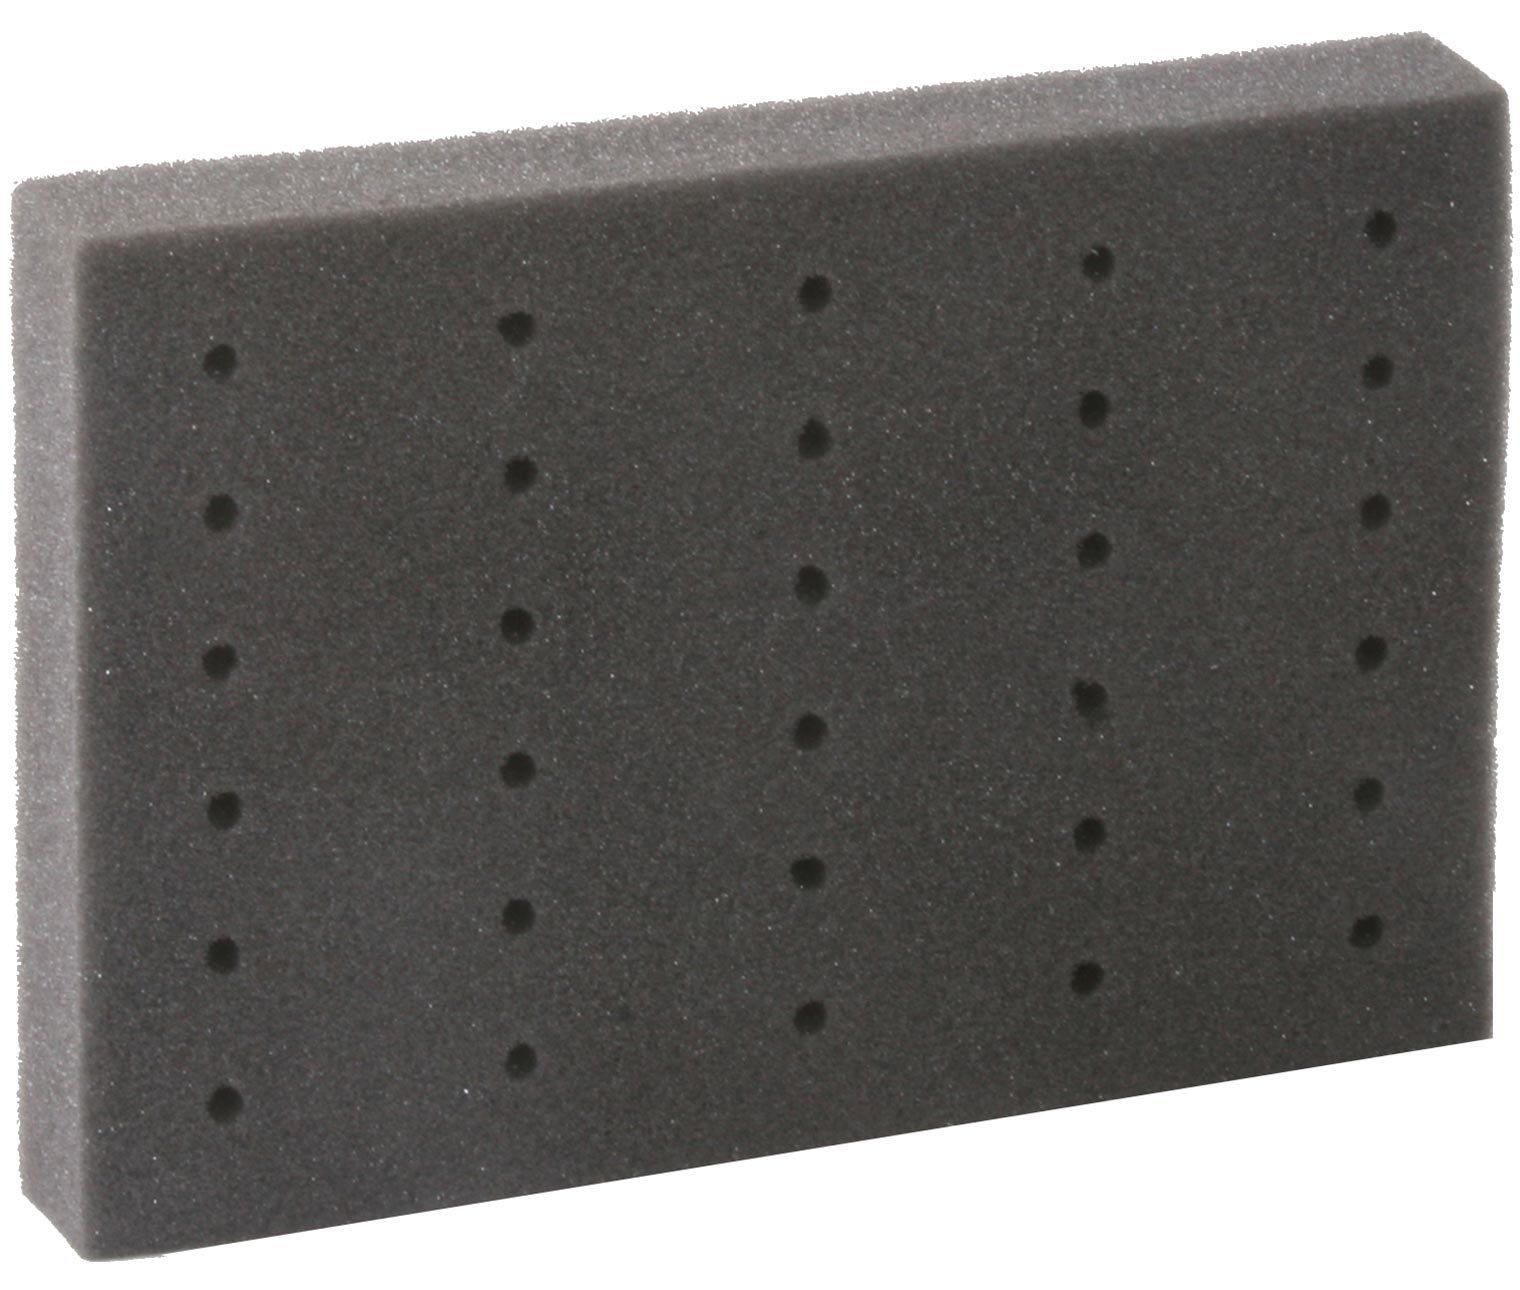 Foam Test Tube Racks For 250uL & 400uL Microcentrifuge Tubes